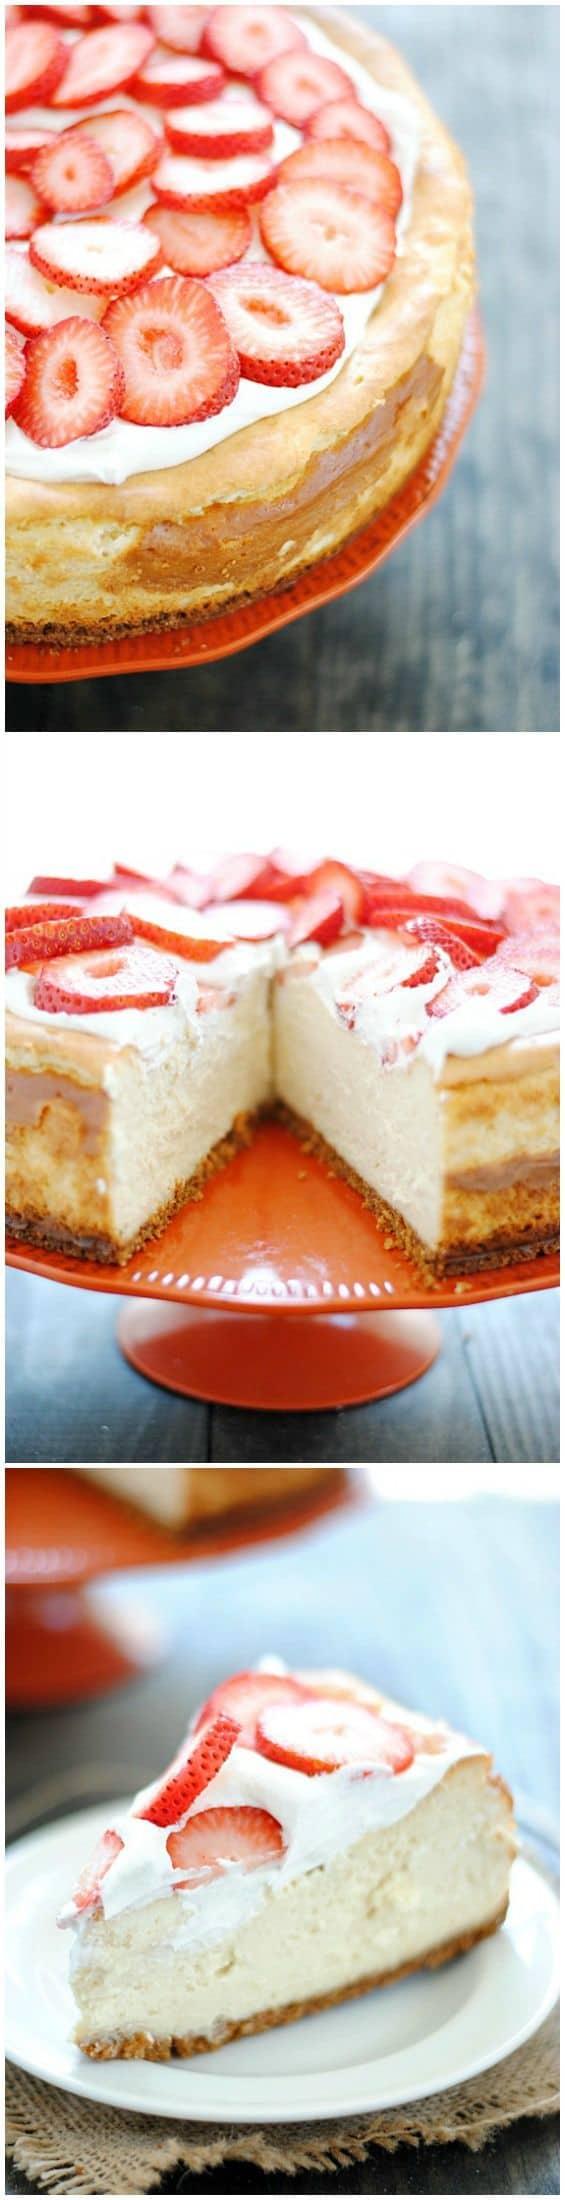 New York-Style Cheesecake   www.somethingswanky.com